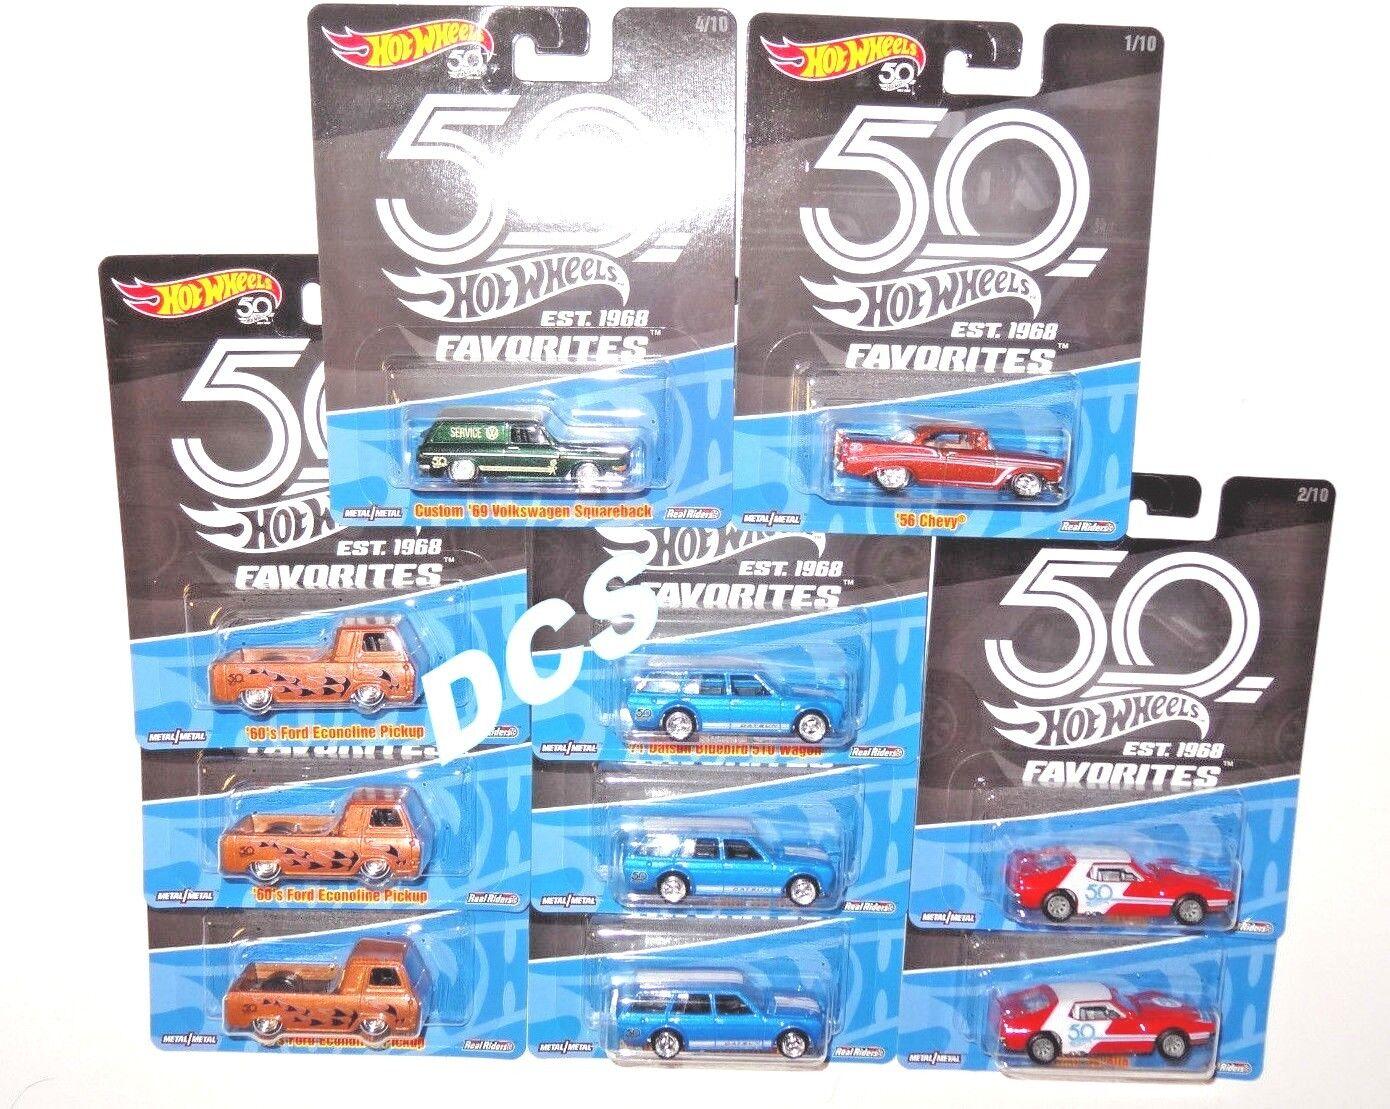 Hot Wheels 2018 50th aniversario favoritos de un caso de coche 10 FLF35-956A En Stock